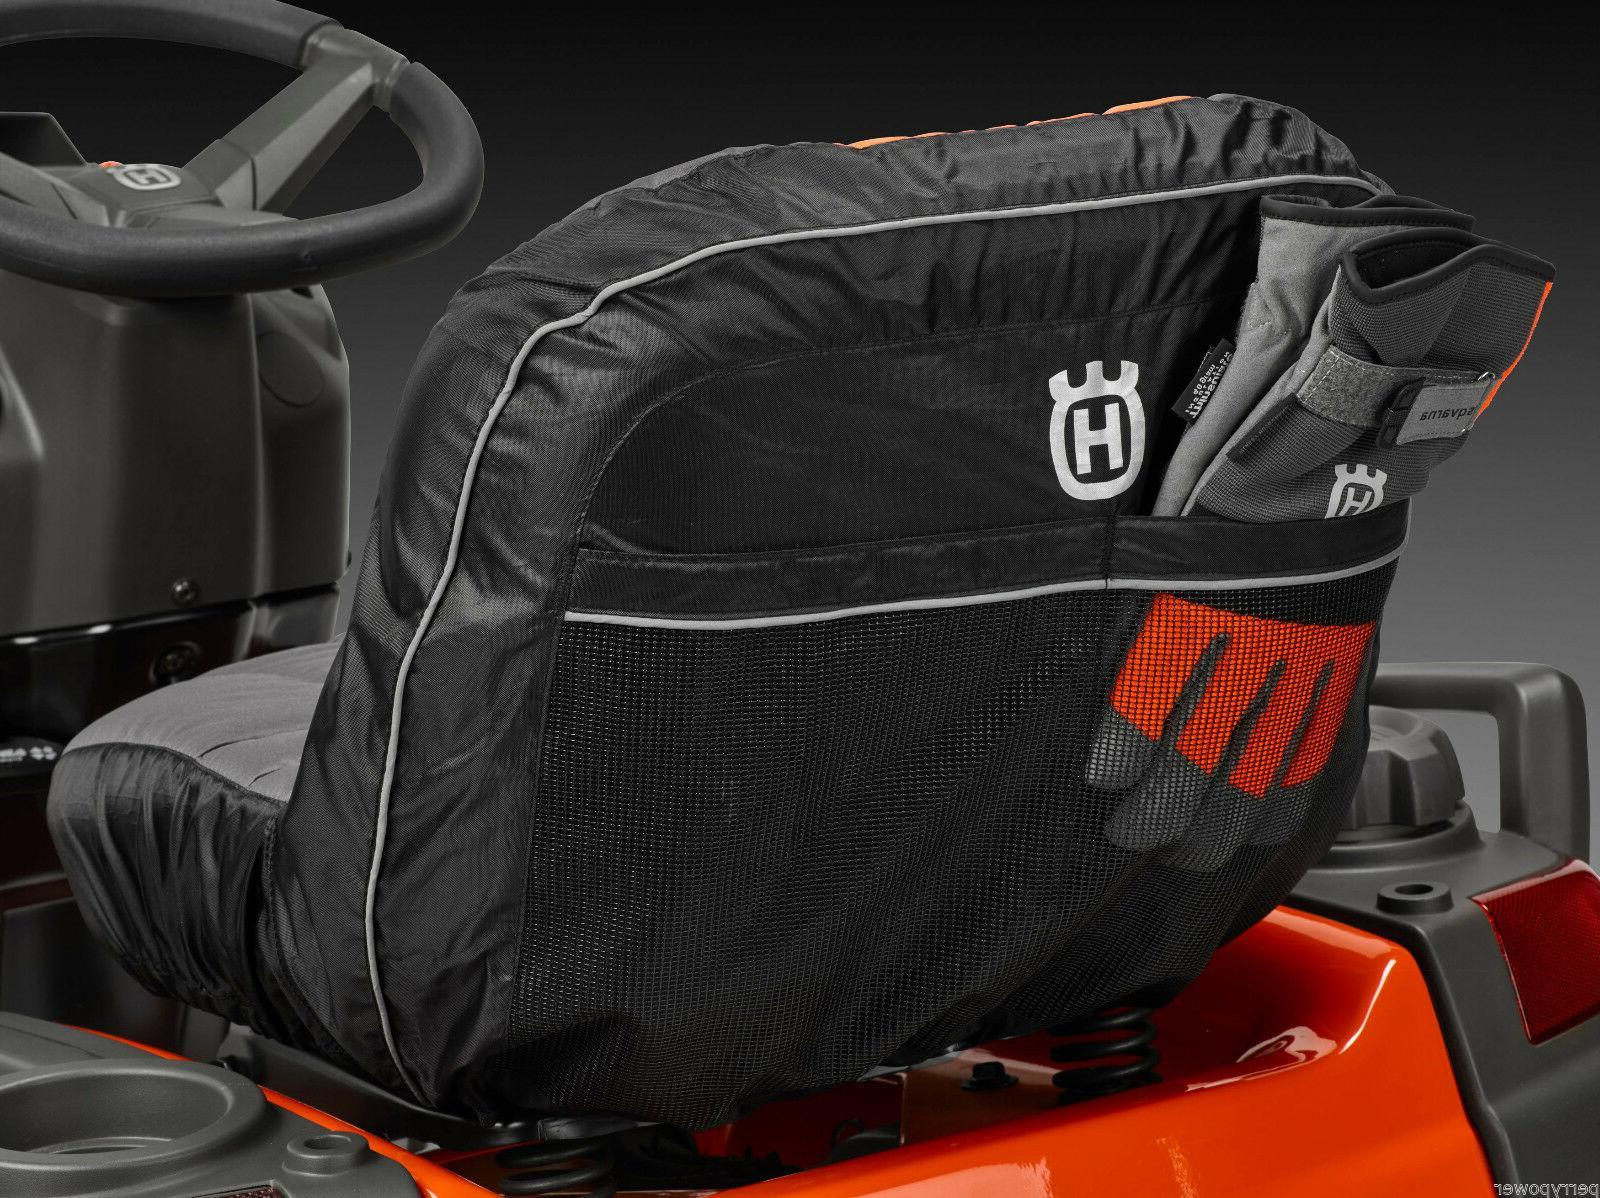 New OEM Husqvarna Seat Cover Gear Warranty